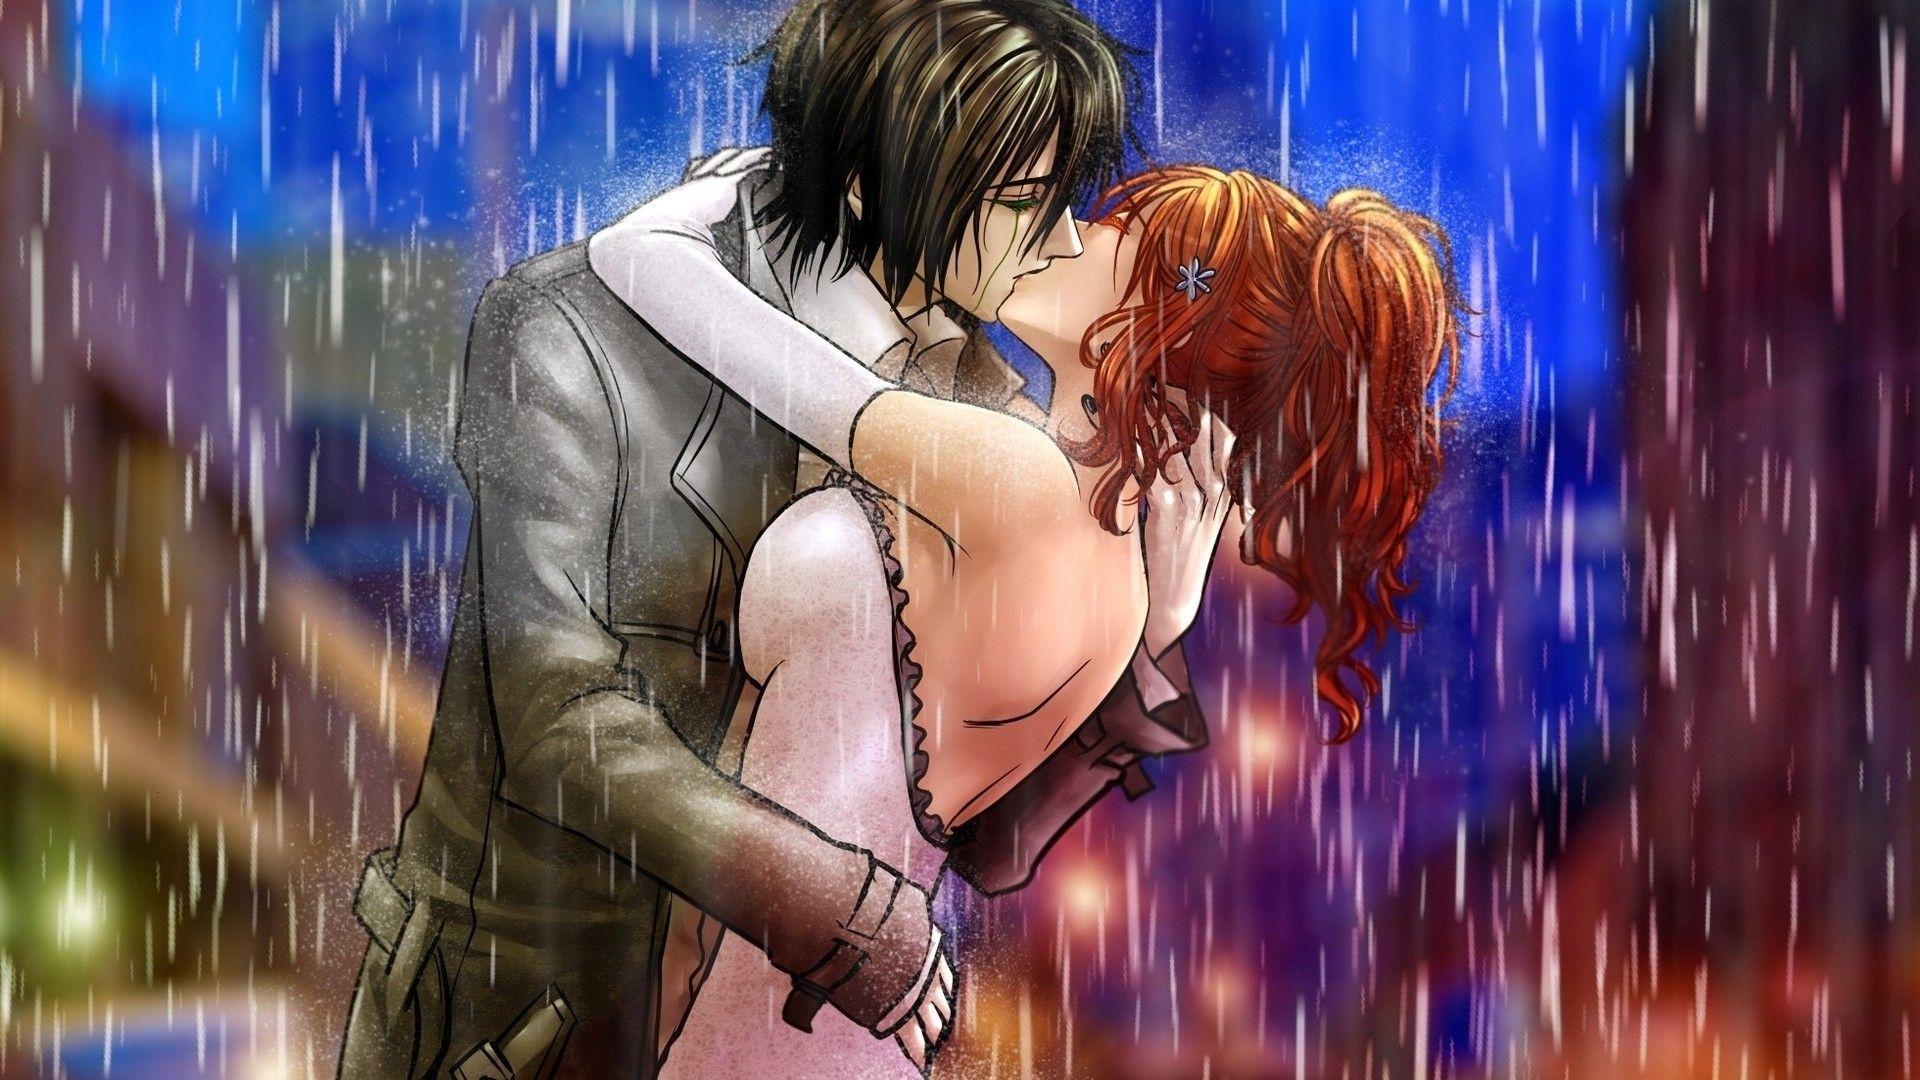 Love Anime Couple Kiss Anime Couple Kiss Anime Anime Kiss